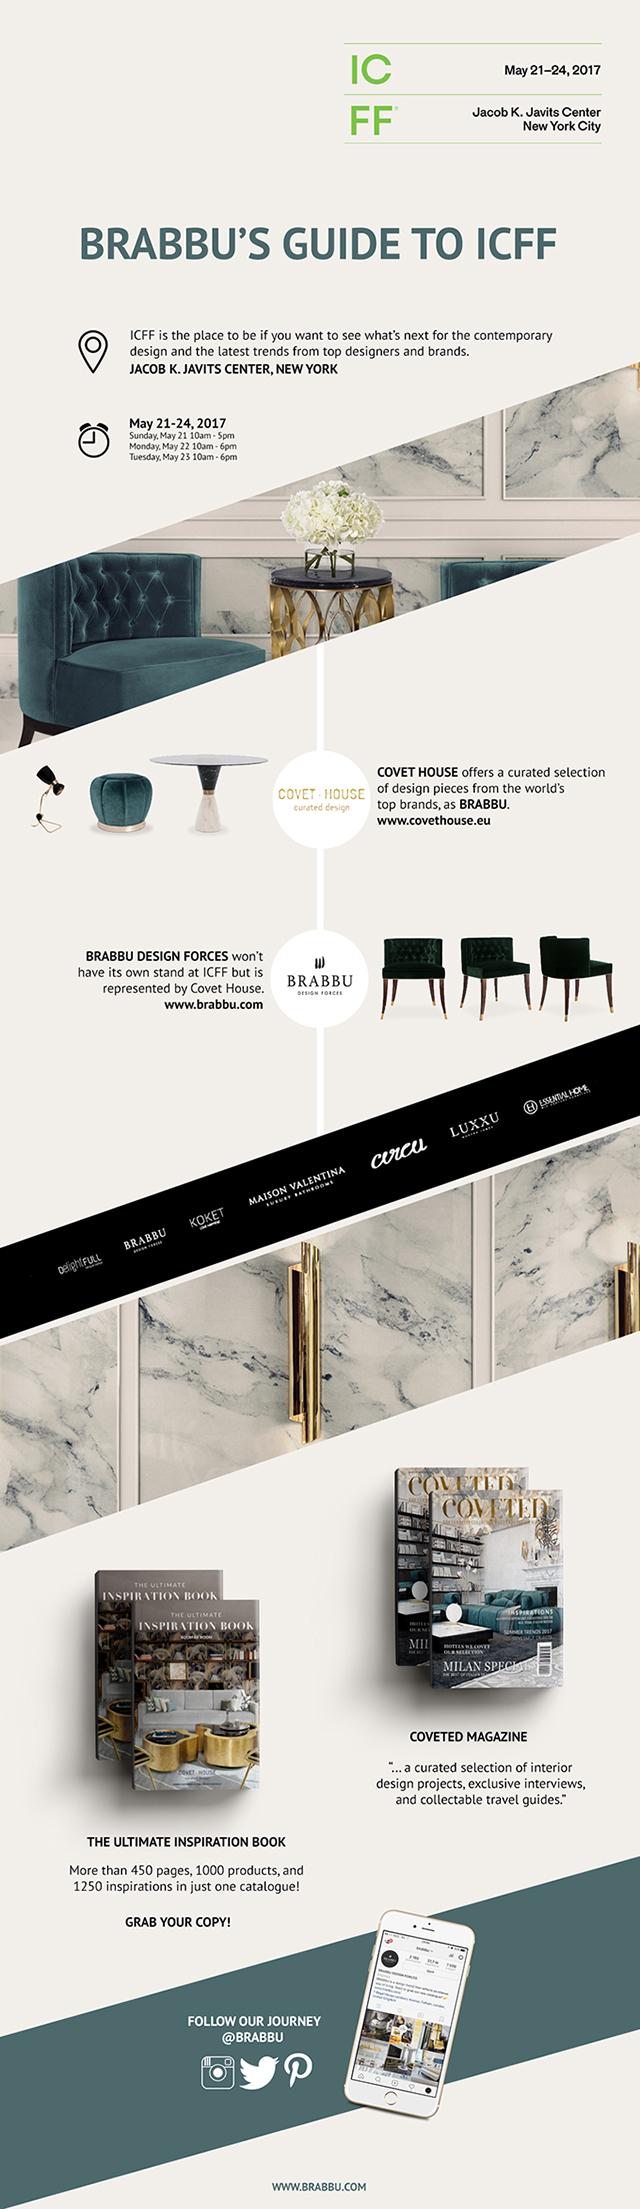 Brabbu Presents Ultimate Guide For ICFF 2017 & New York Design Week ➤ To see more news about the Interior Design Shops in the world visit us at www.interiordesignshop.net/ #interiordesign #homedecor #shopping @interiordesignshop @koket @bocadolobo @delightfulll @brabbu @essentialhomeeu @circudesign @mvalentinabath @luxxu @covethouse_ icff 2017 Brabbu Presents Ultimate Guide For ICFF 2017 & New York Design Week inspirations